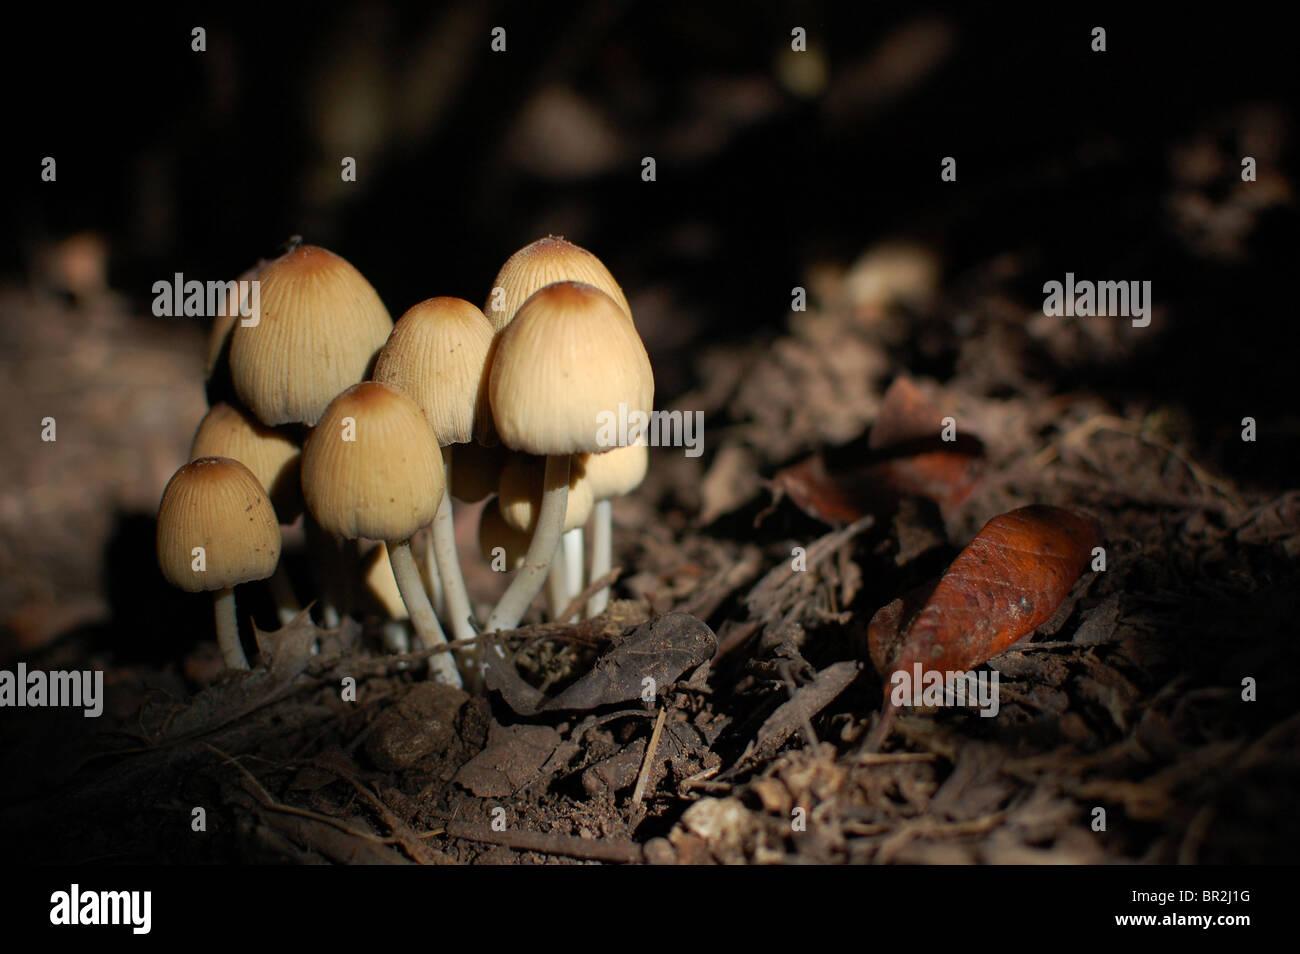 fungi-growing-on-woodland-floor-BR2J1G.j